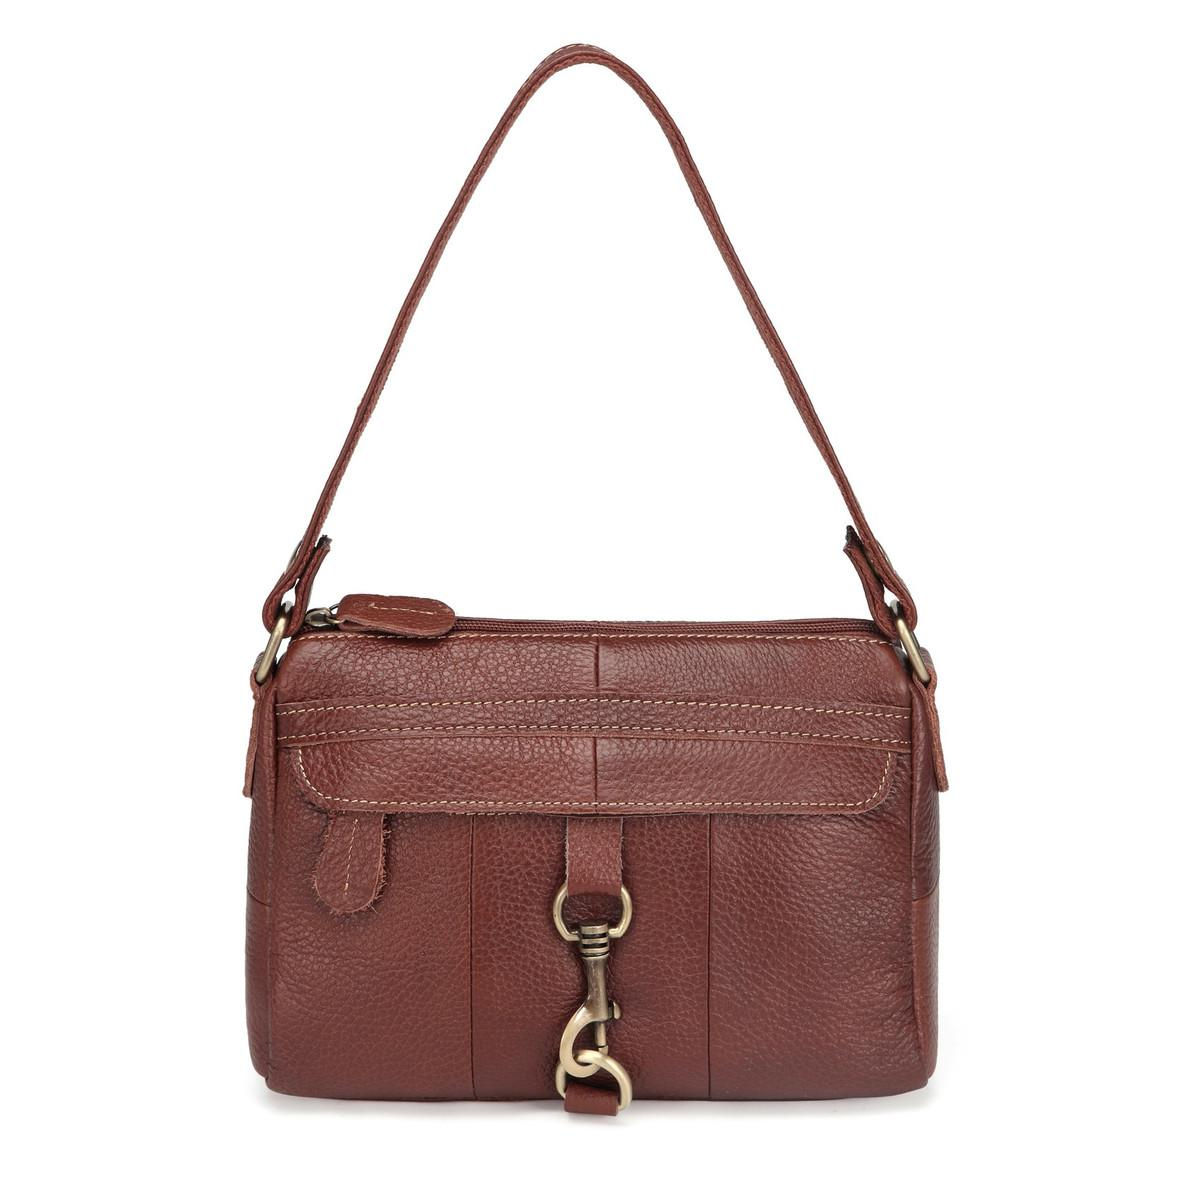 f9954b5ac4 Guaranteed 100% Cowhide Genuine Leather Women Messenger Bags Ladies  Shoulder Handbags Vintage Crossbody Bags For Girls MM2314 Wholesale  Handbags Cheap ...